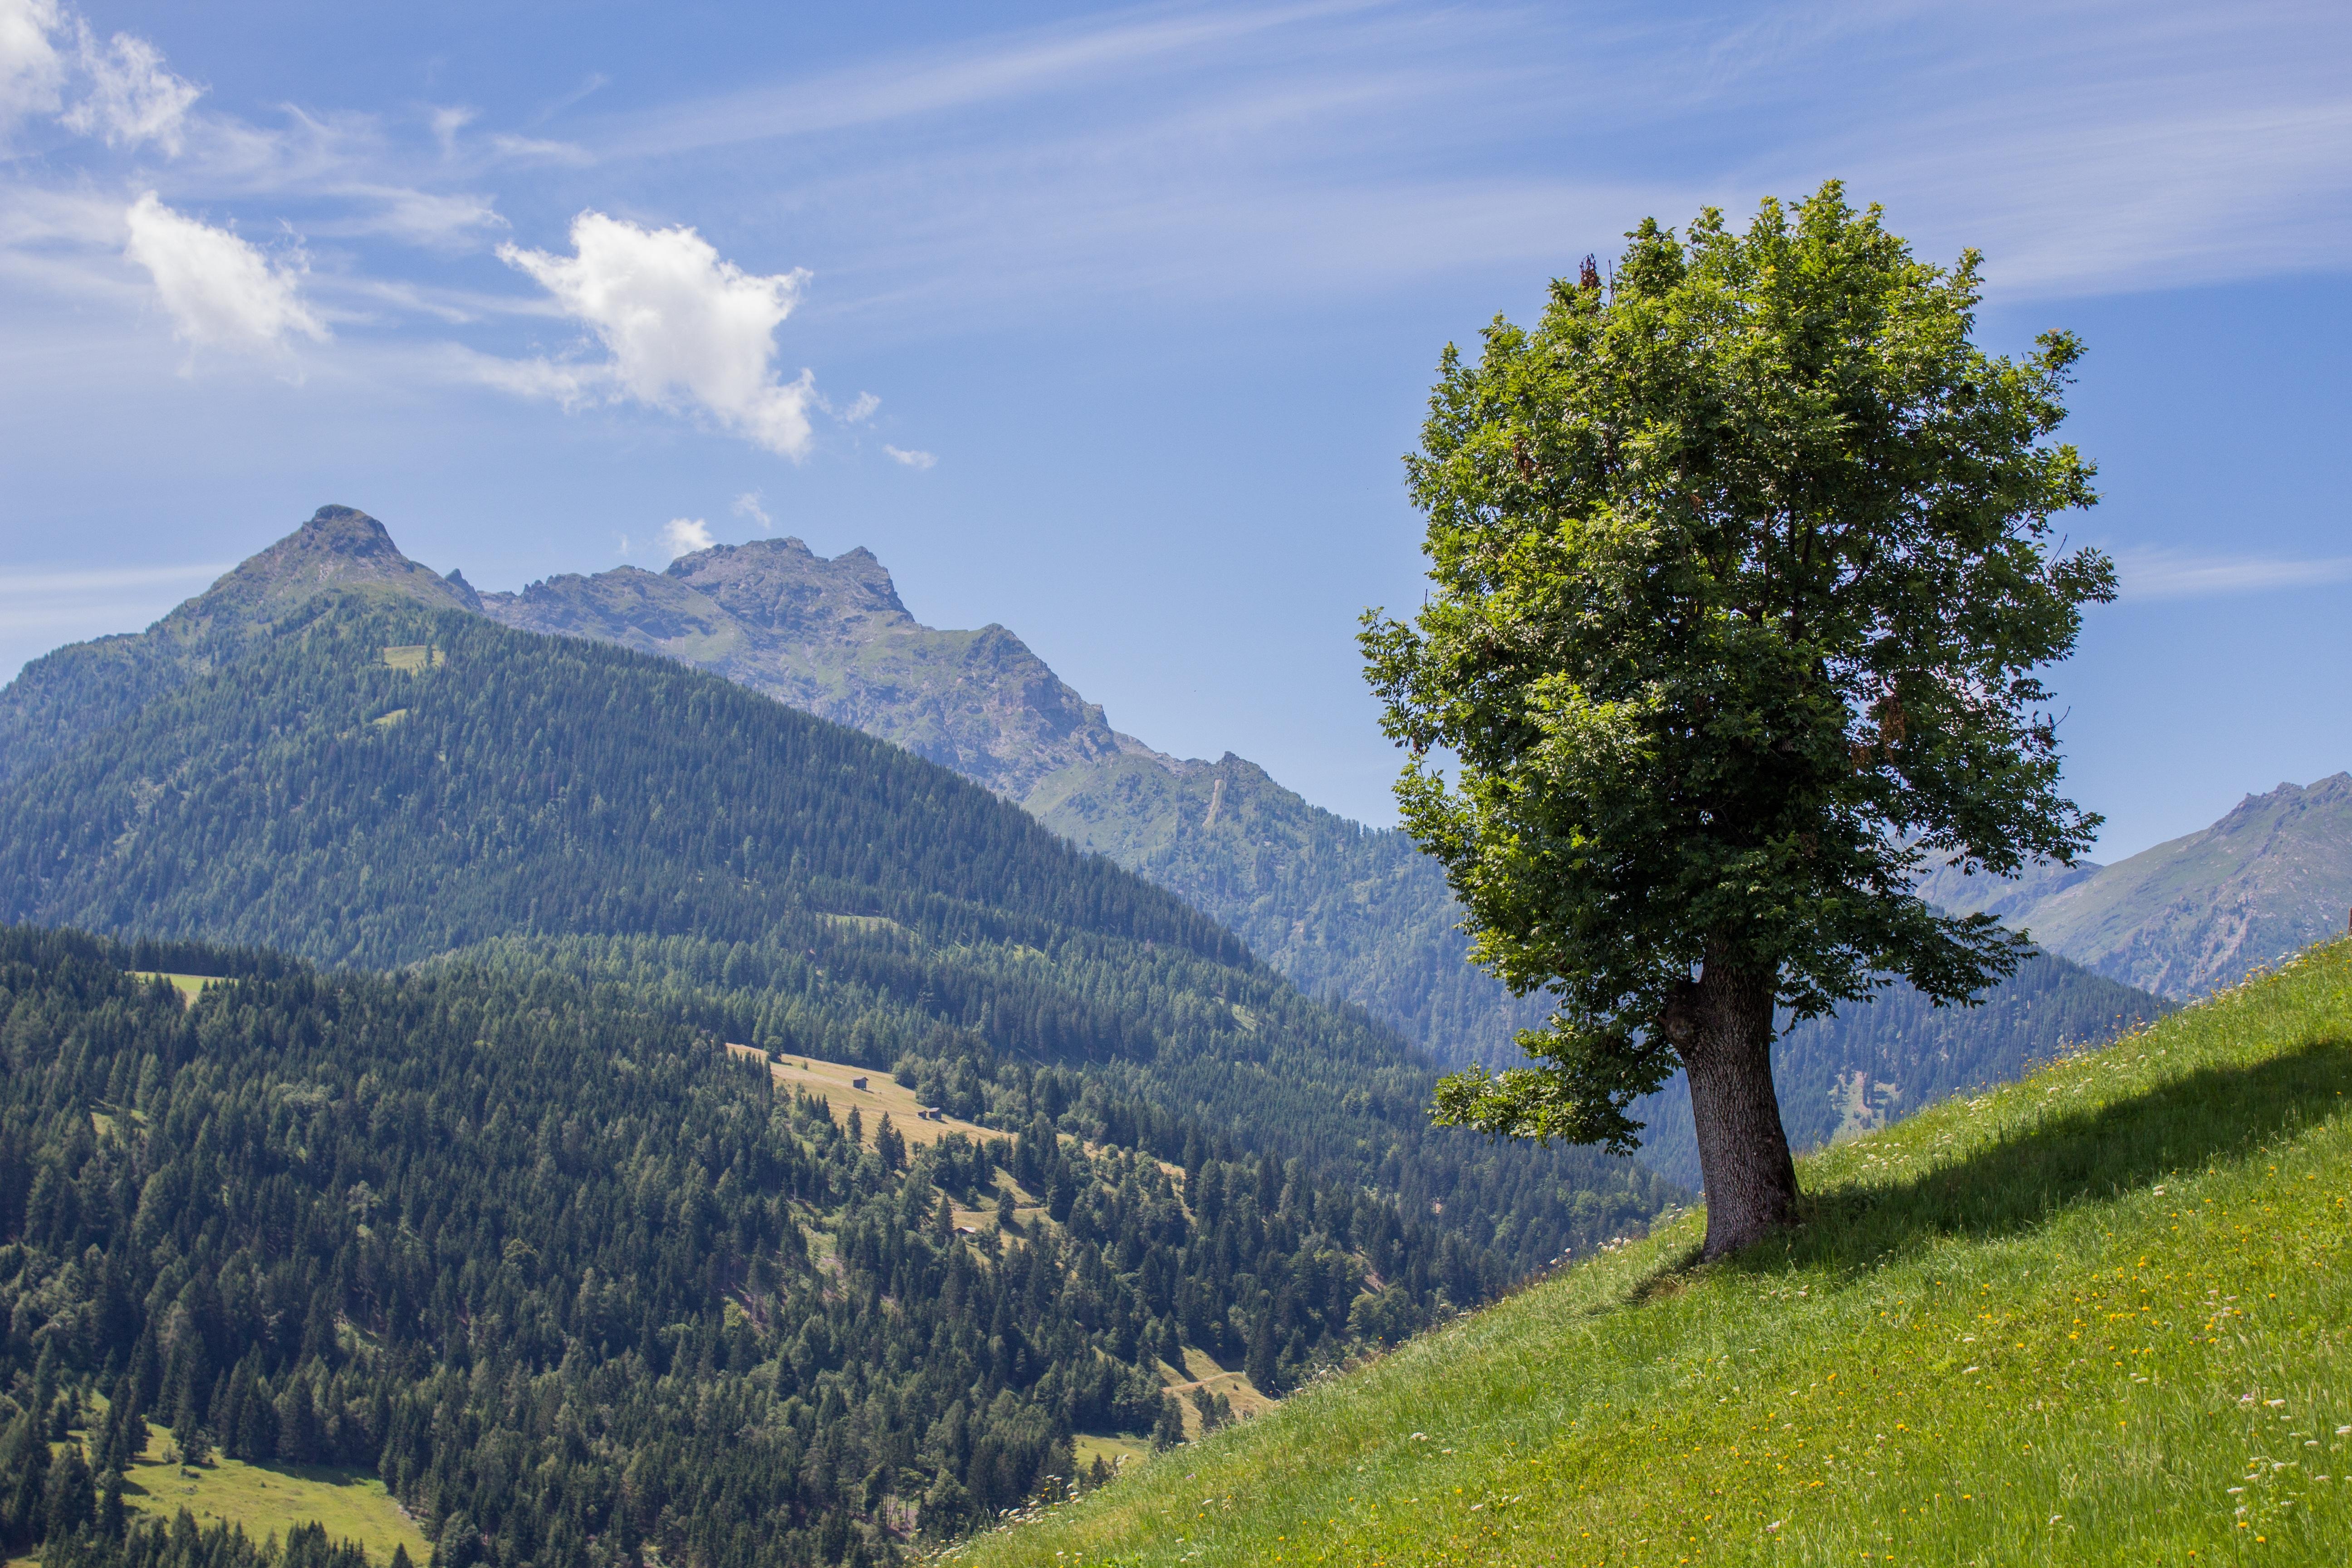 images gratuites paysage arbre la nature for t herbe r gion sauvage montagne nuage. Black Bedroom Furniture Sets. Home Design Ideas